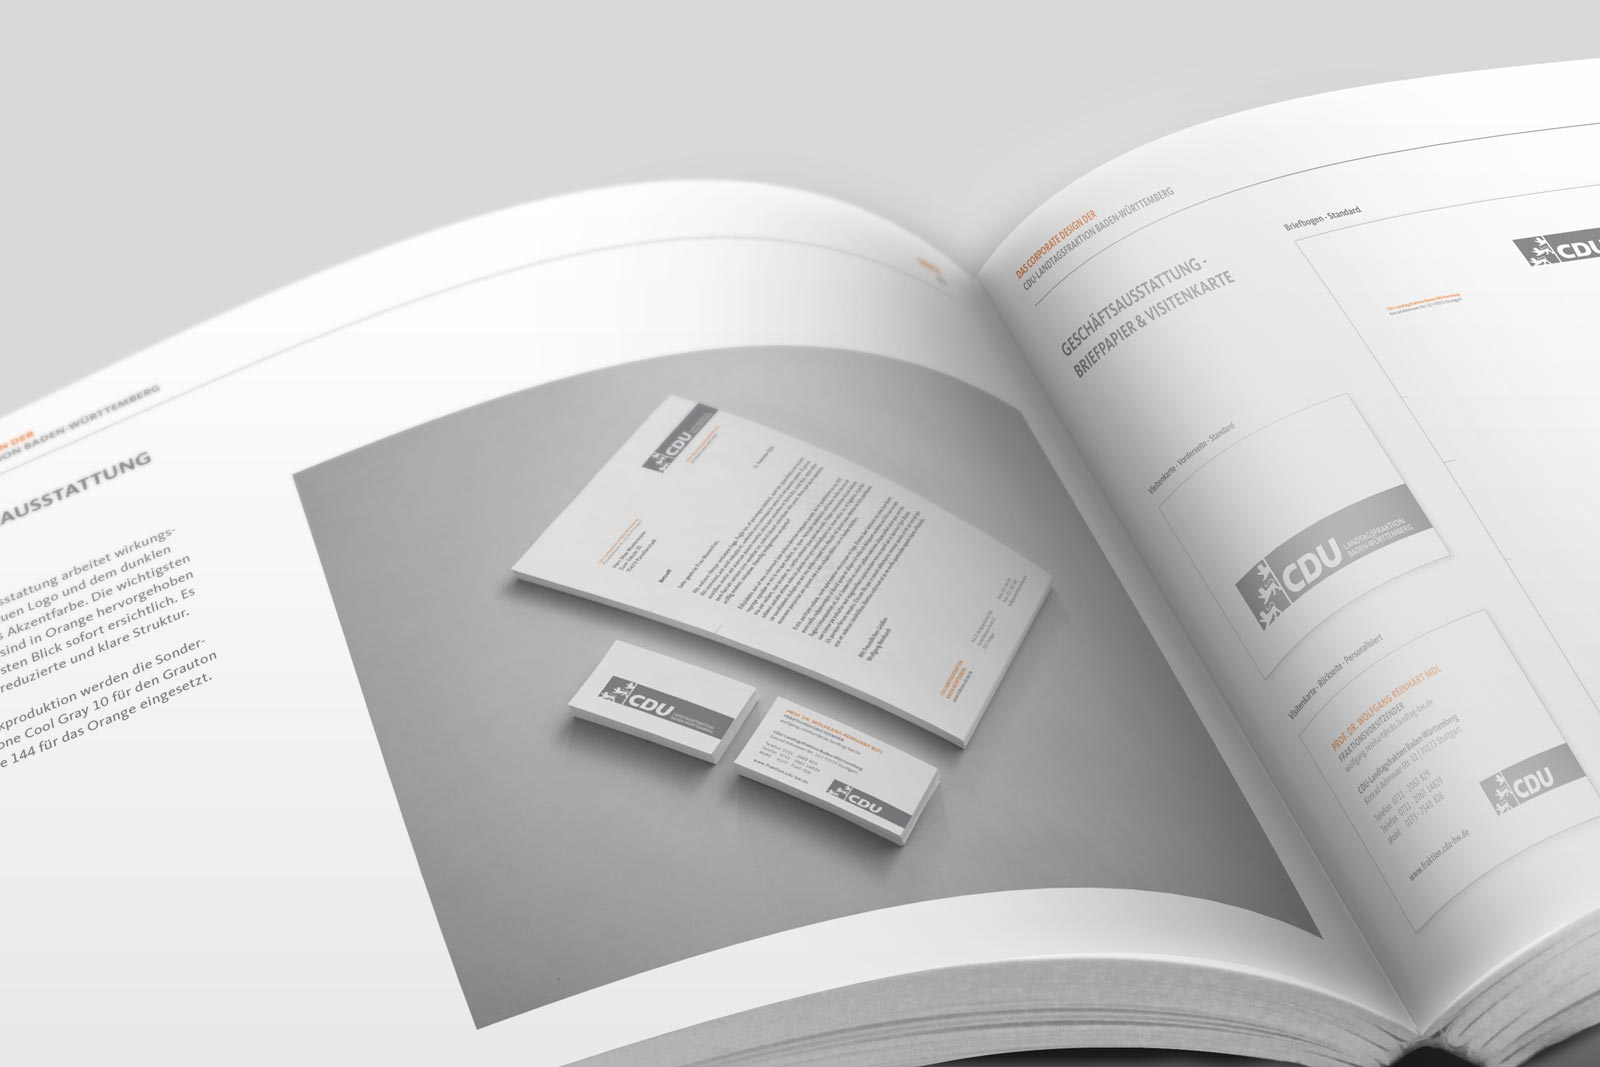 CDU_LF_BW, Styleguide, Corporate Design Relaunch, Redesign, Detail 2